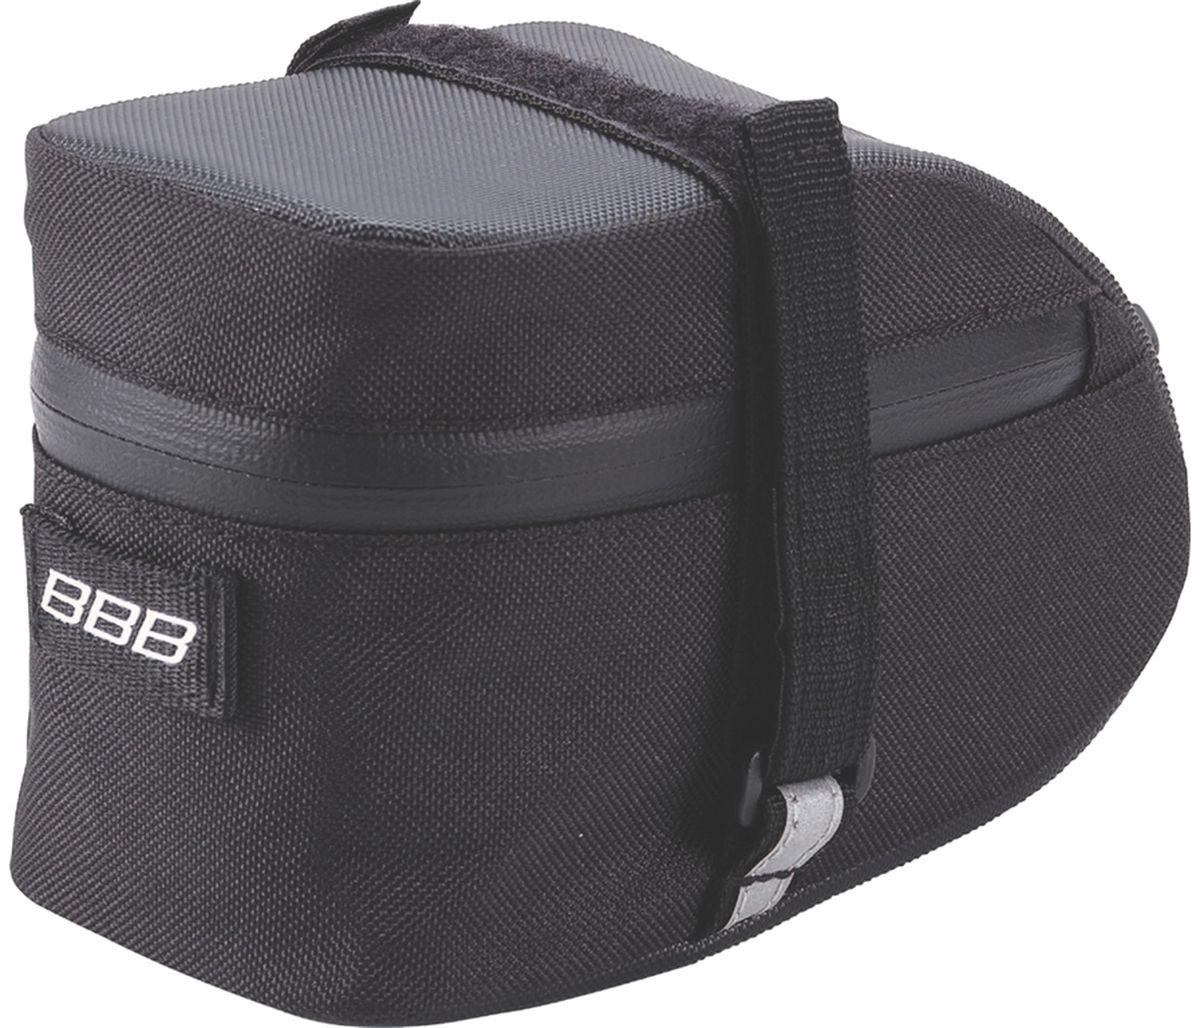 "Велосумка под седло BBB ""EasyPack"", цвет: черный. Размер M"